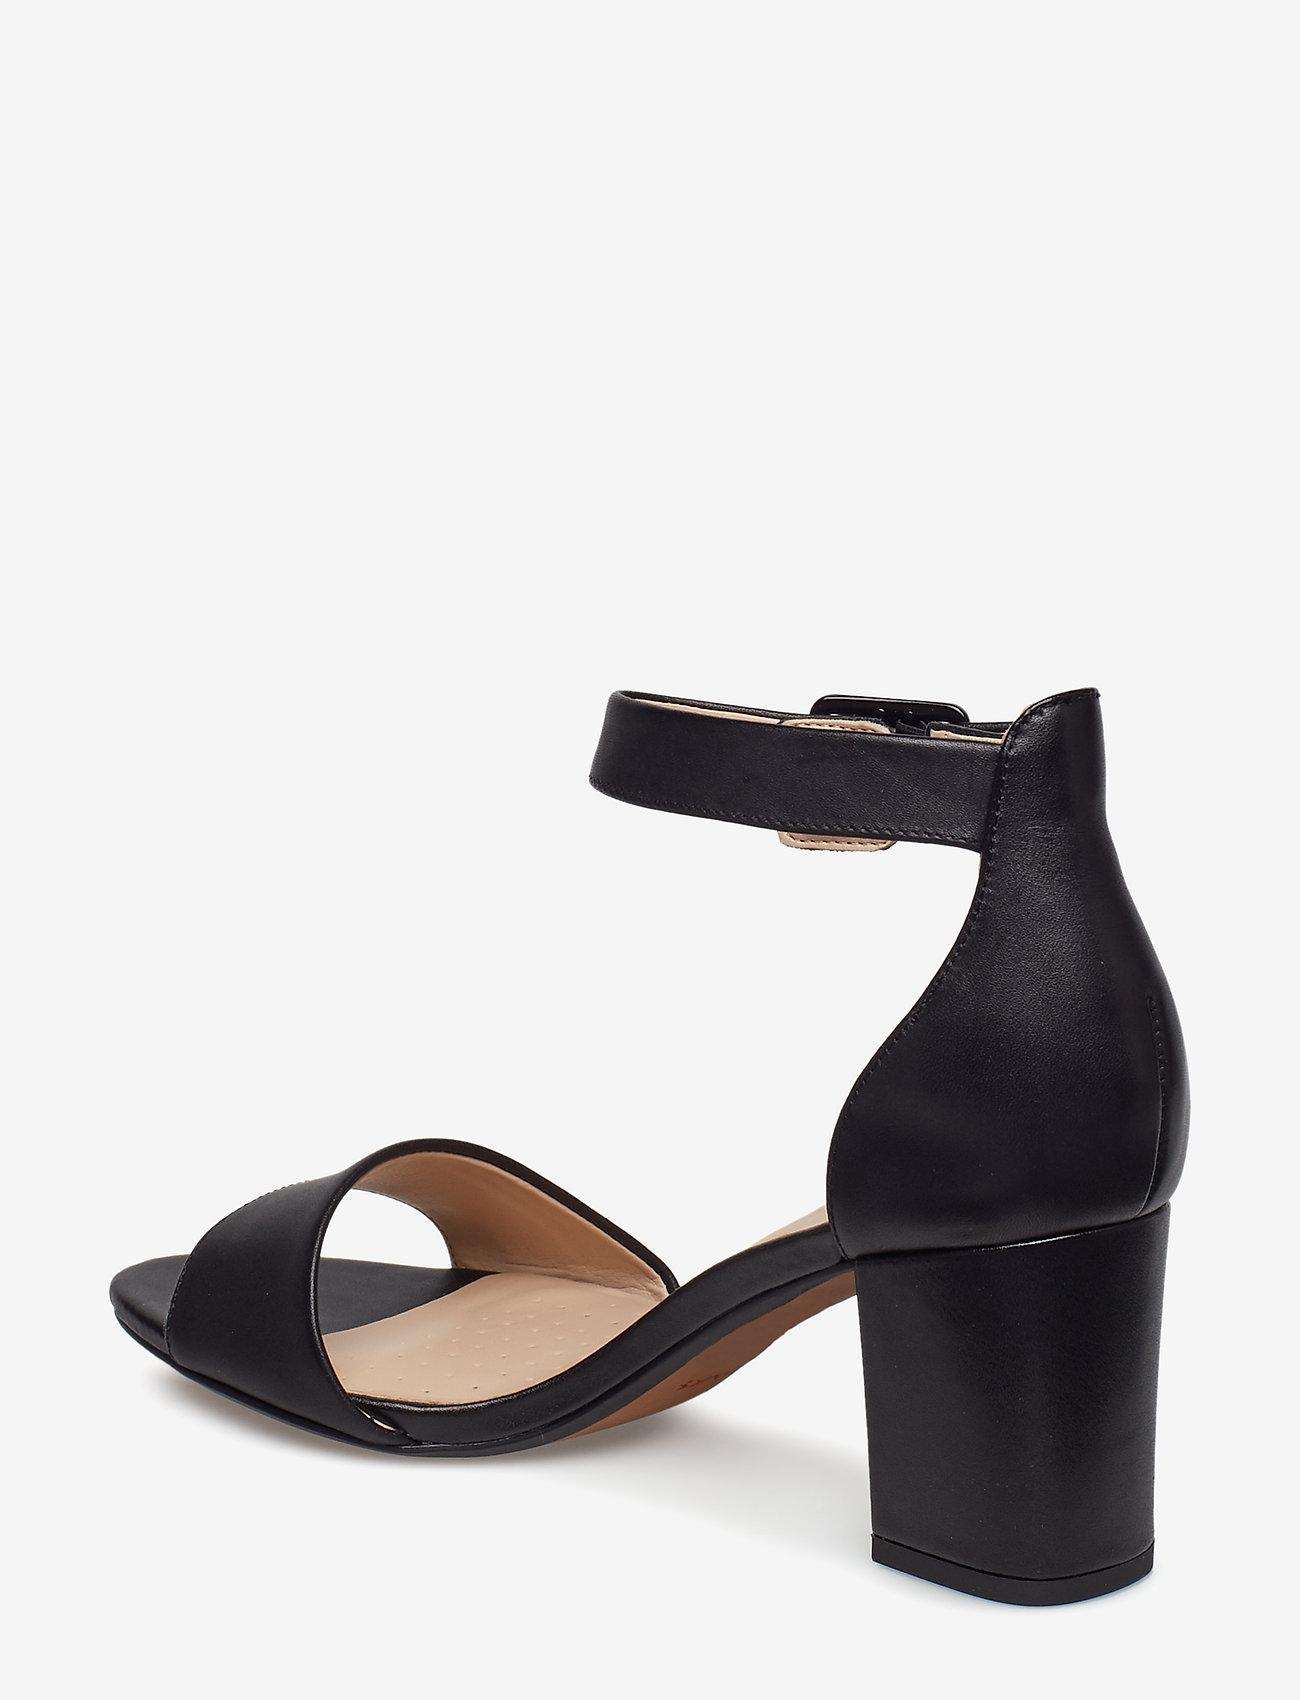 Deva Mae (Black Leather) - Clarks